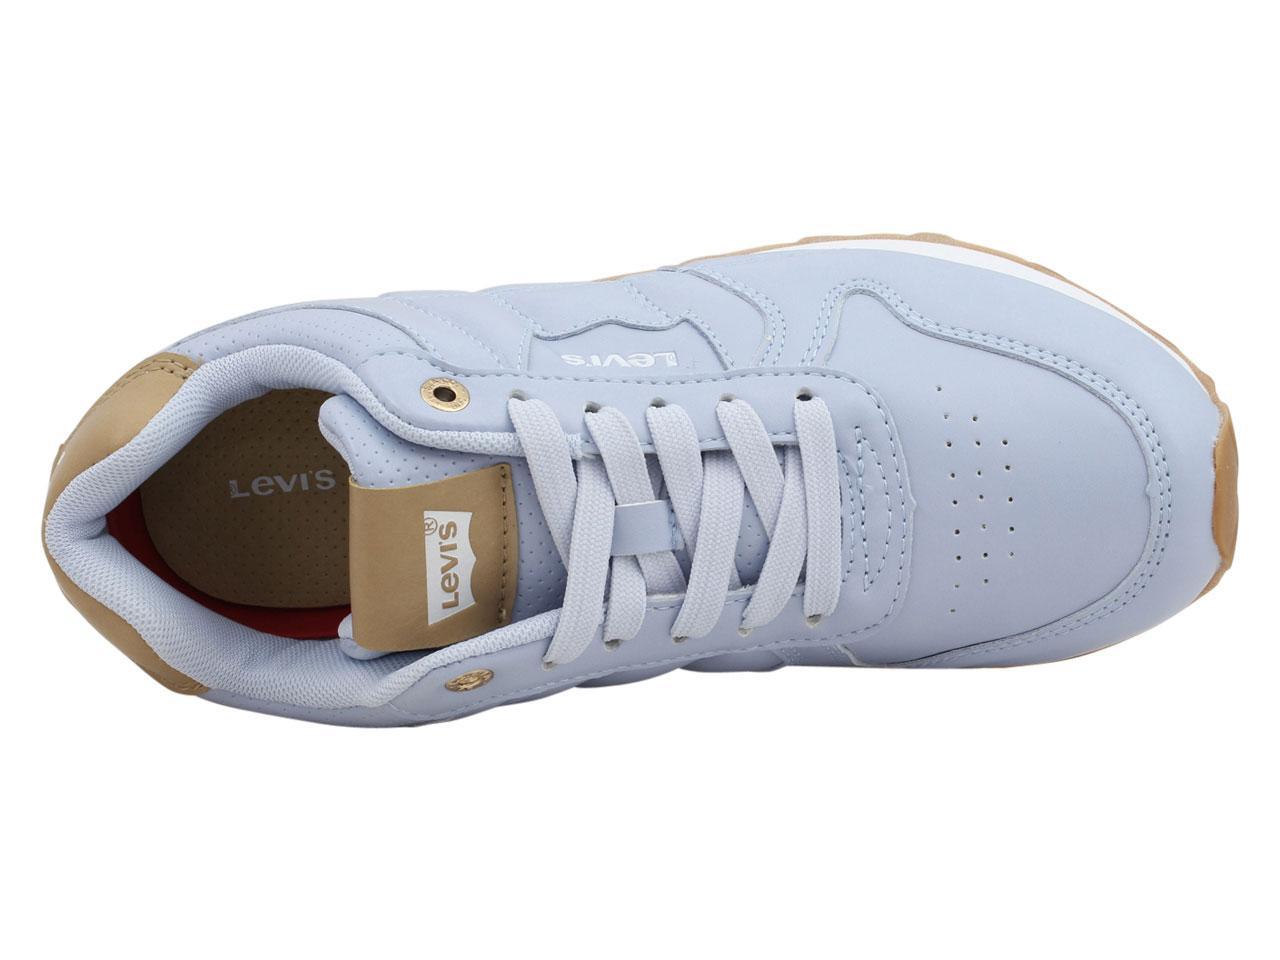 womens levi tennis shoes Shop Clothing